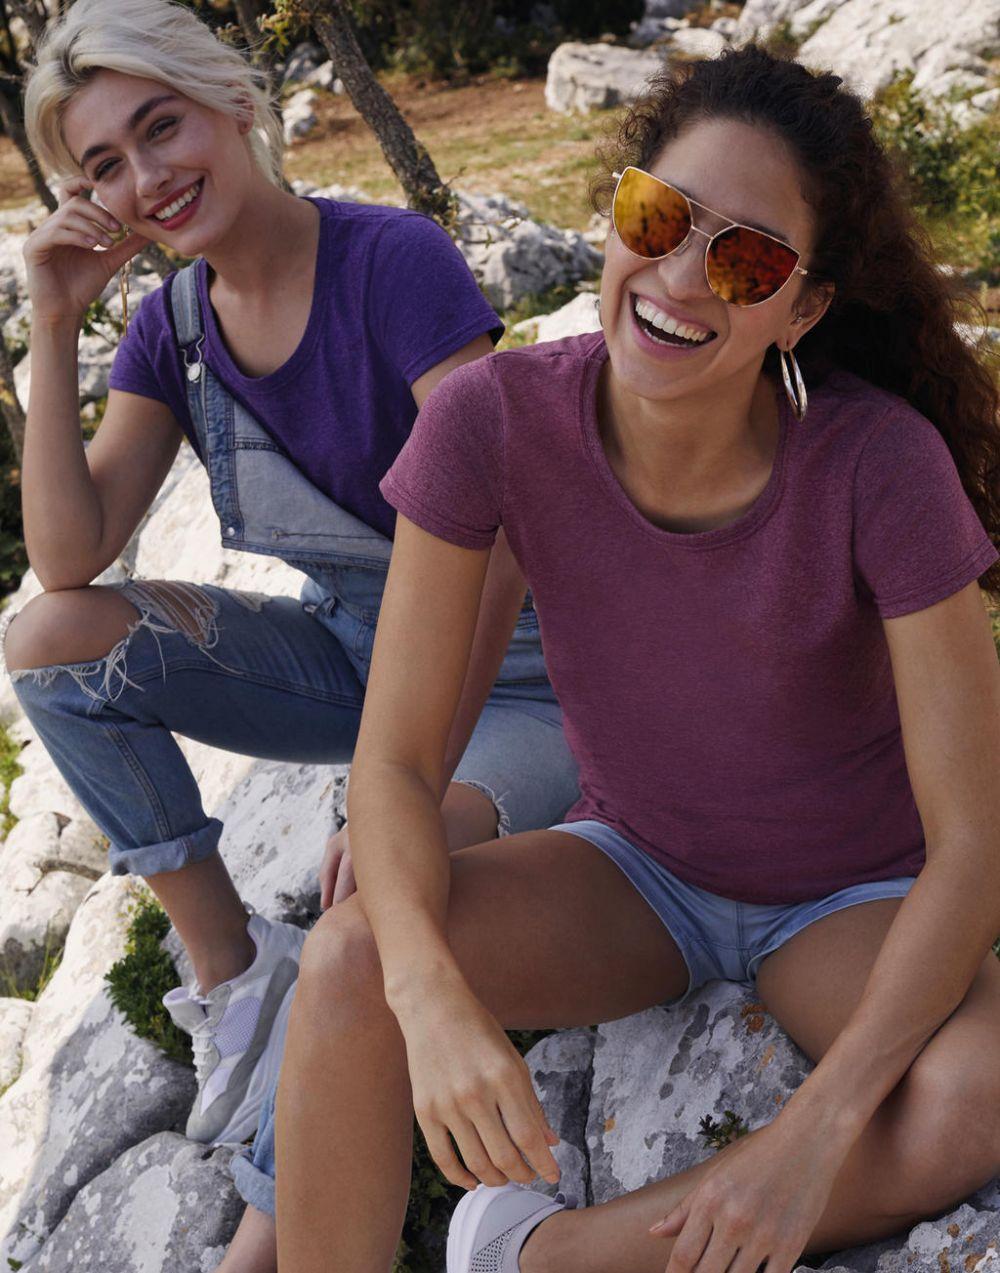 Camisetas manga corta fruit of the loom valueweight corte femenino con publicidad vista 1